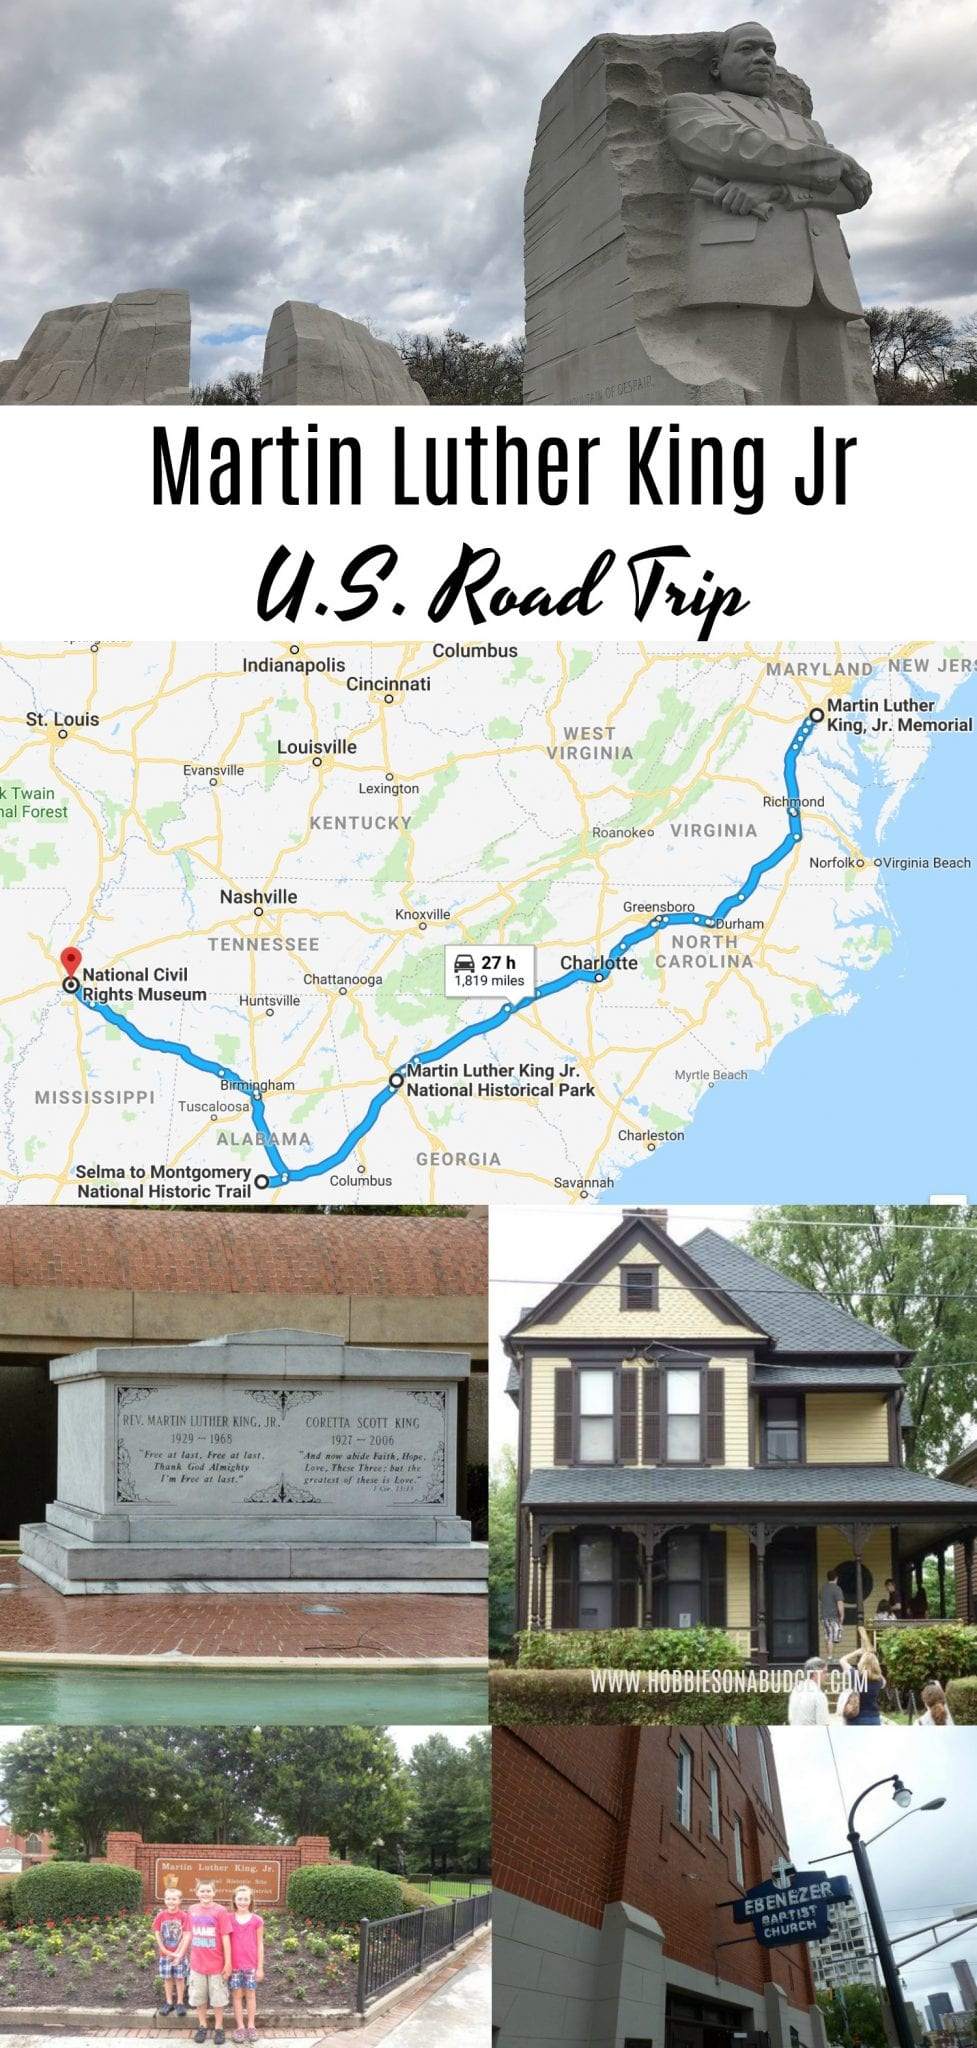 Martin Luther King Jr US Landmark Tour